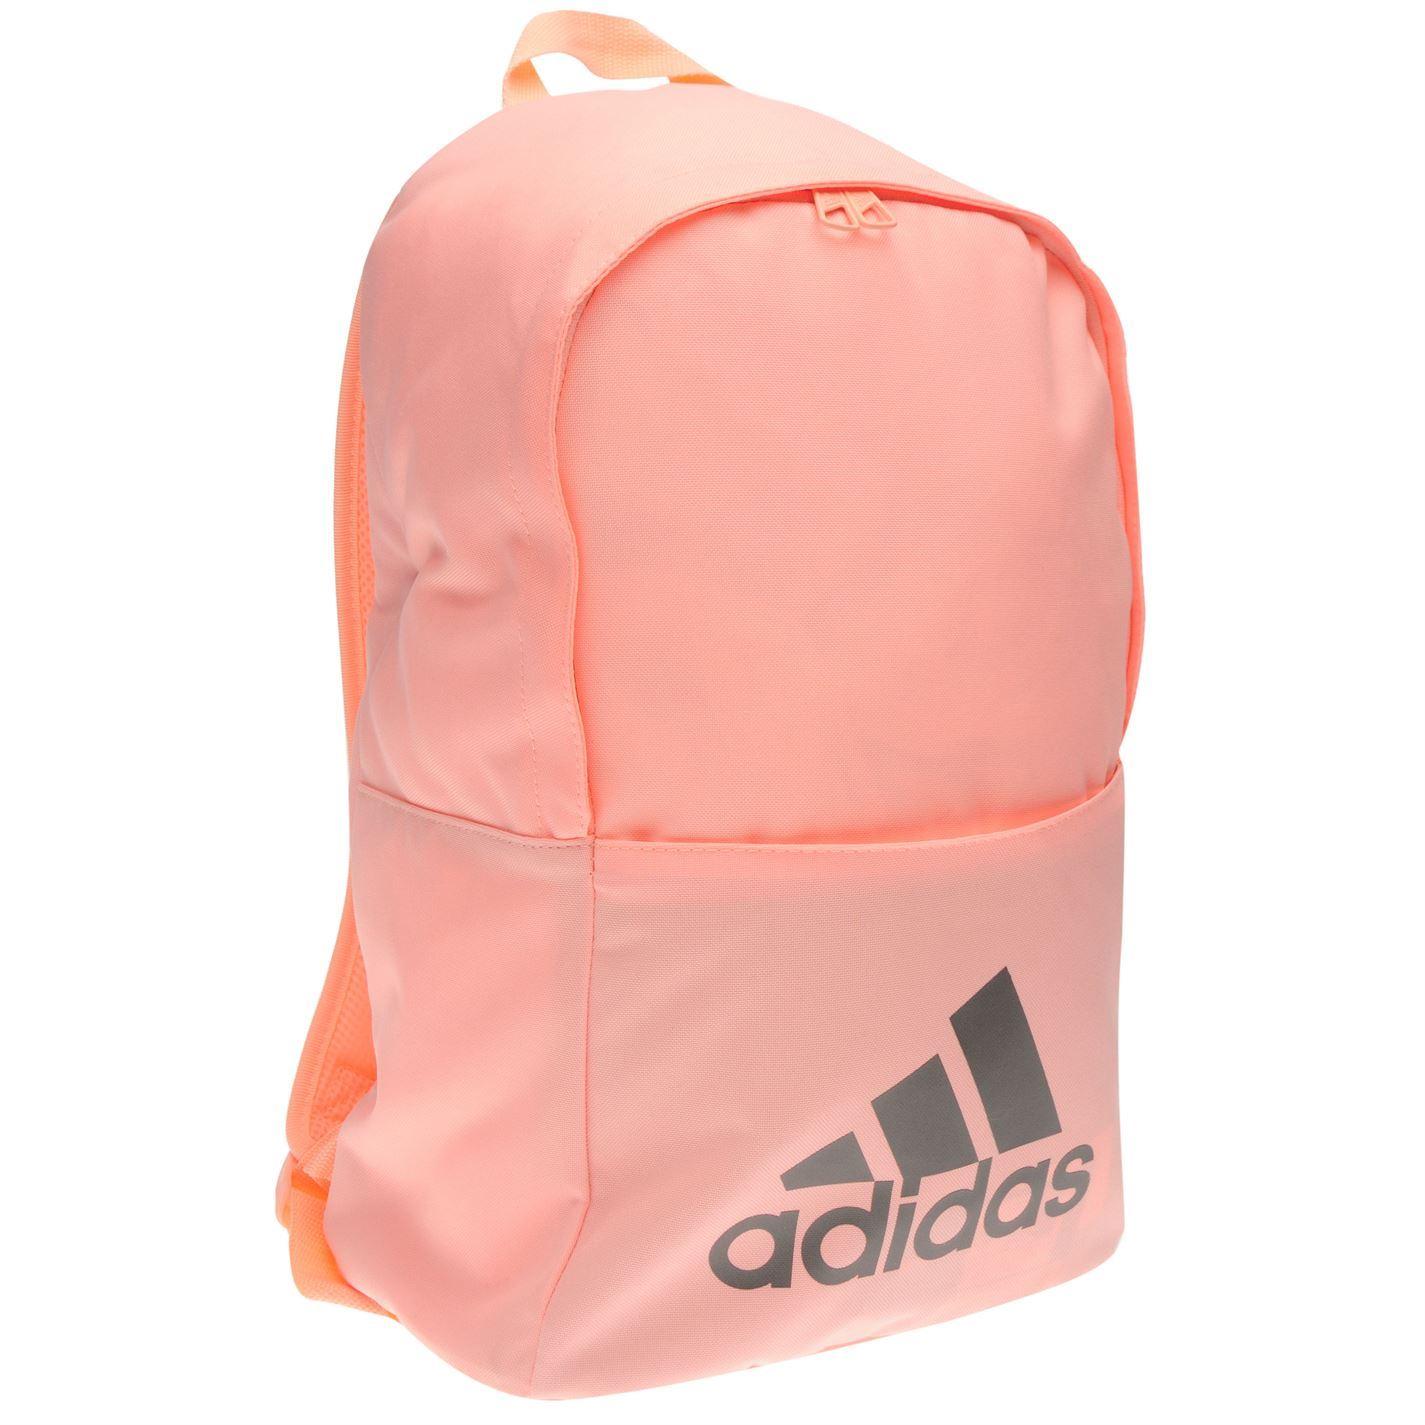 4ab250228b25 adidas Backpacks Bag Rucksack Gymbag Sports Bag